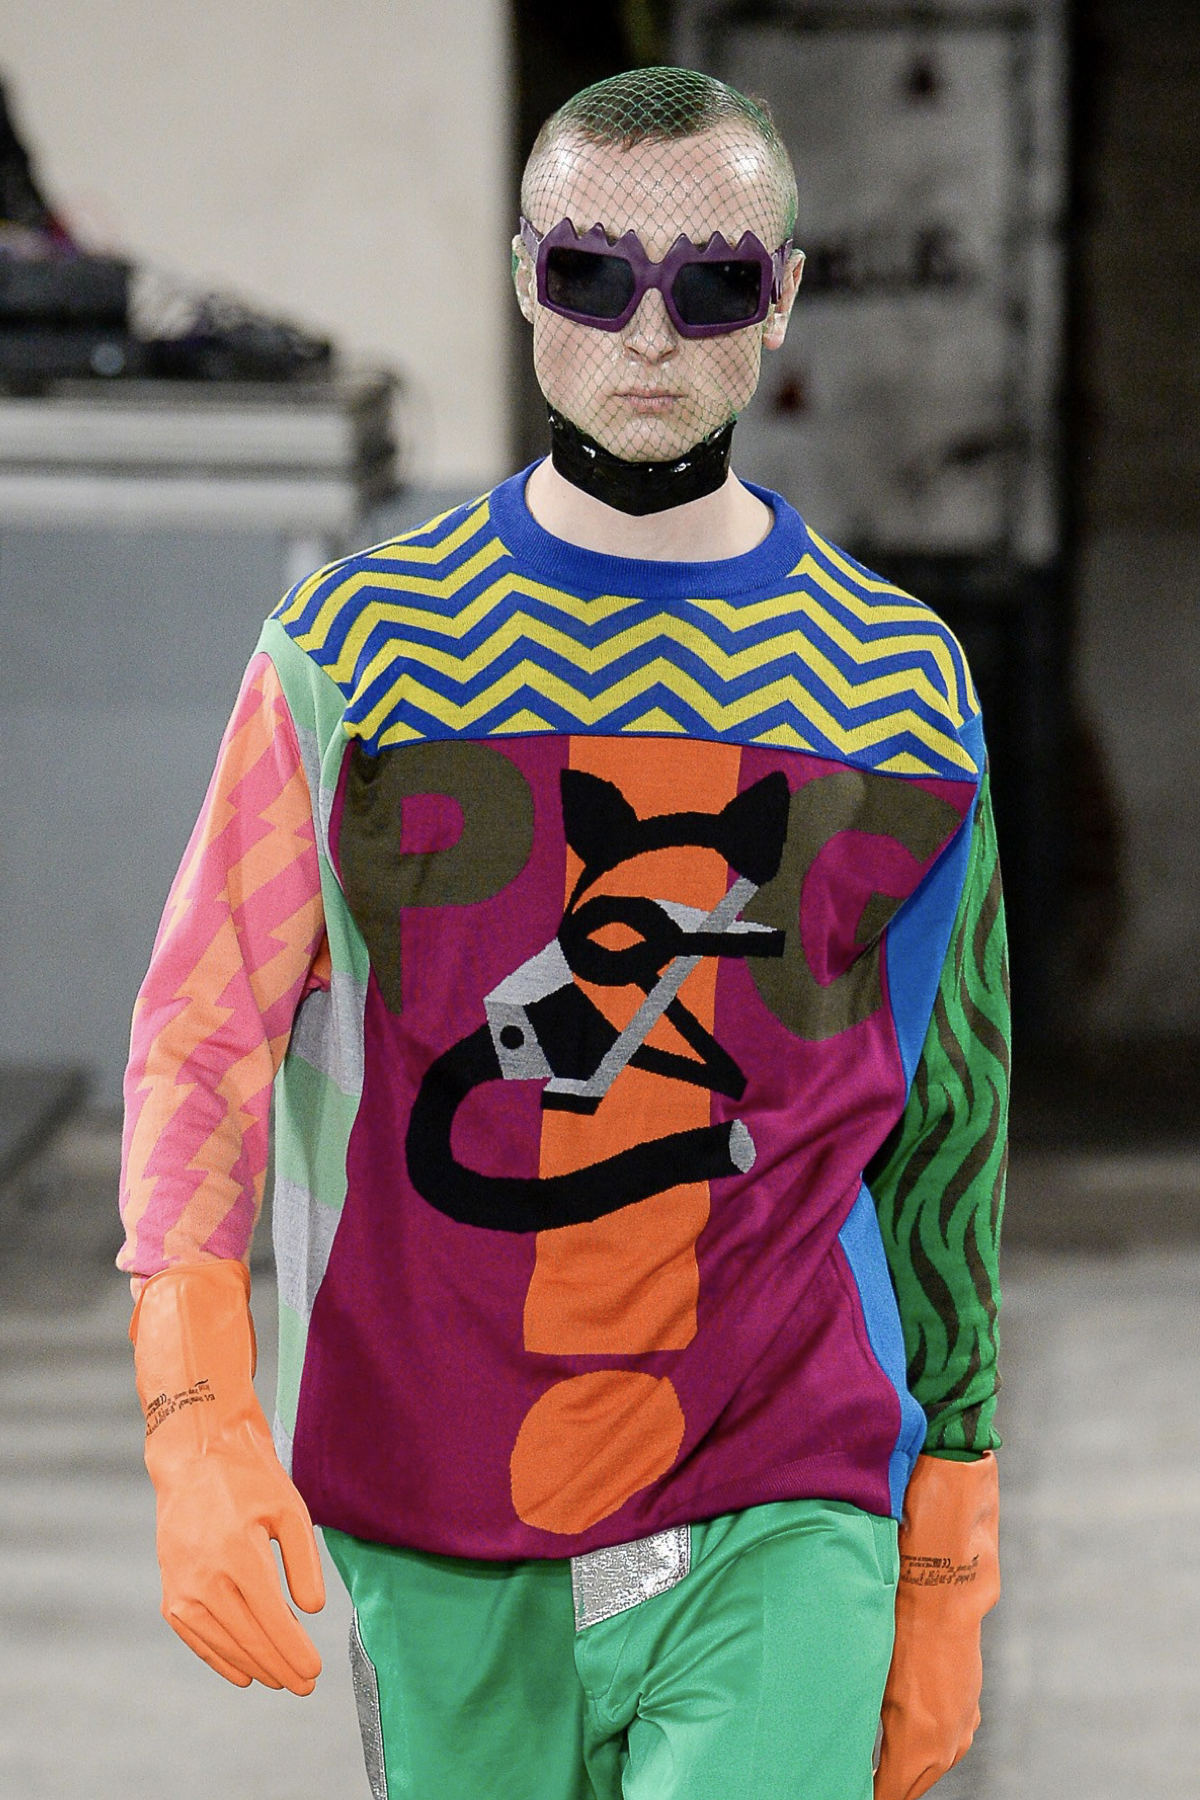 FAKBYFAK x Walter Van Beirendonck  Bliksem Sunglasses. Purple Code: 09/13/03